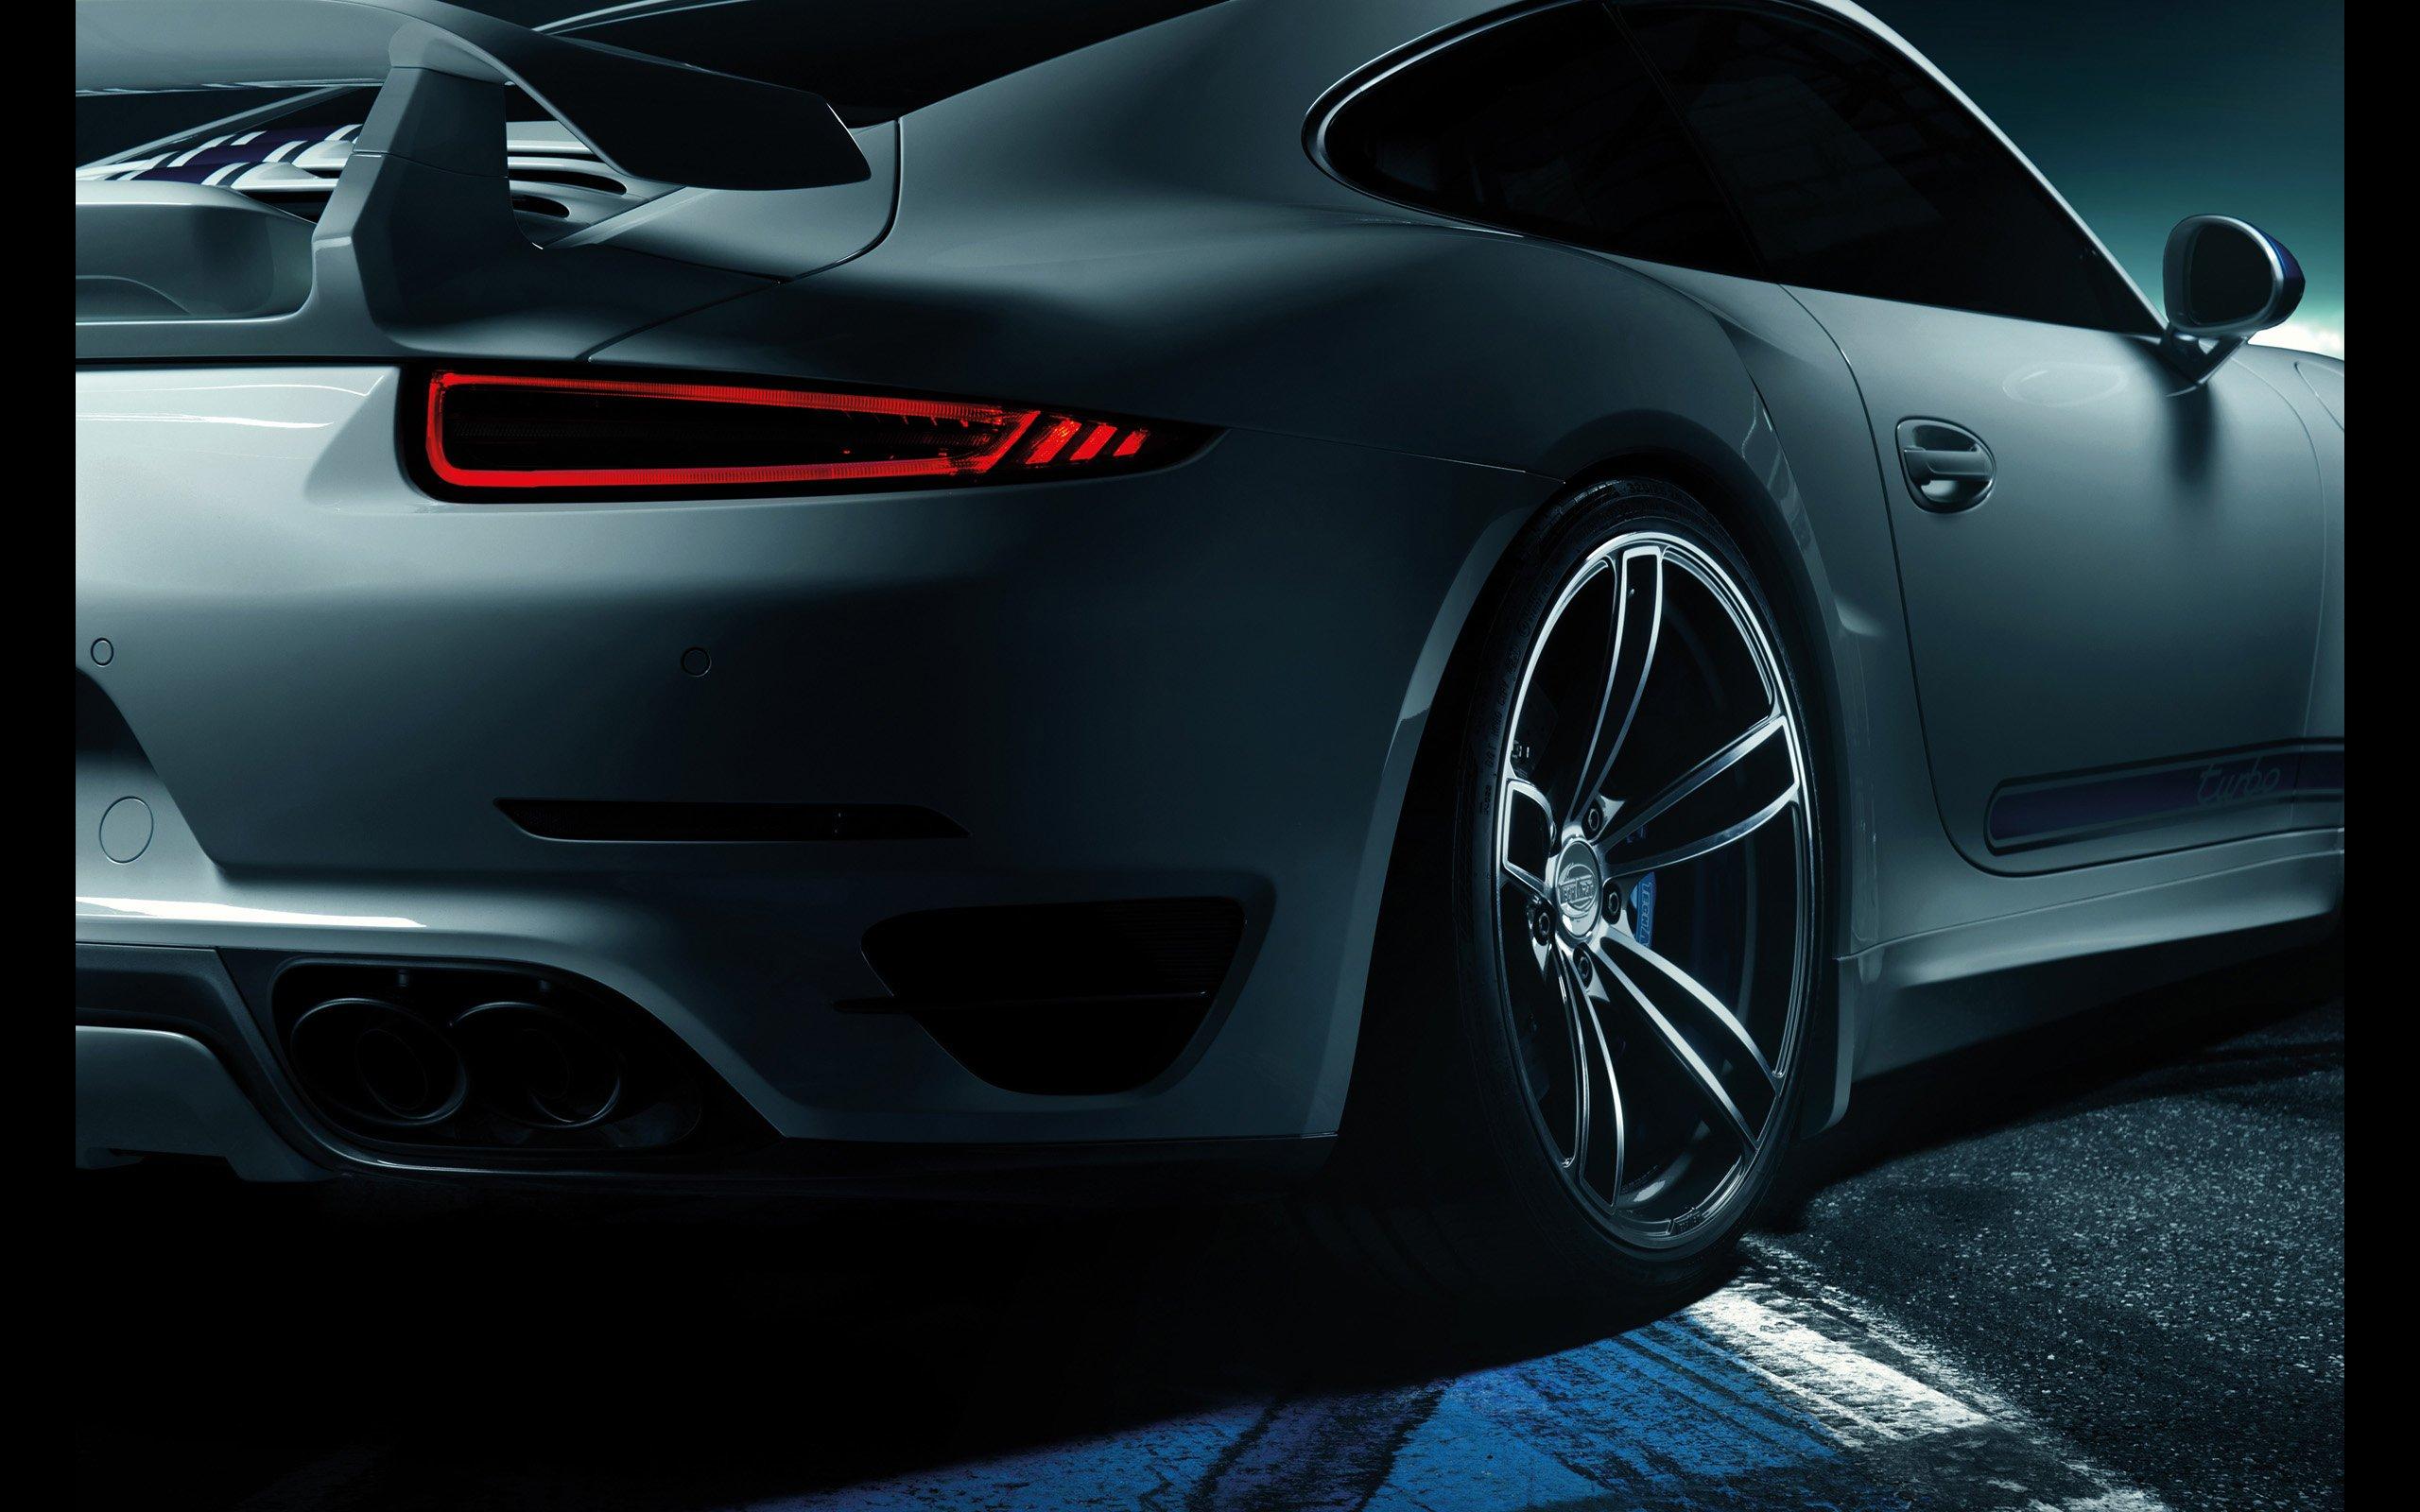 2014 techart porsche 911 turbo 991 supercar tuning wheel g wallpaper 2560x1600 245717 wallpaperup